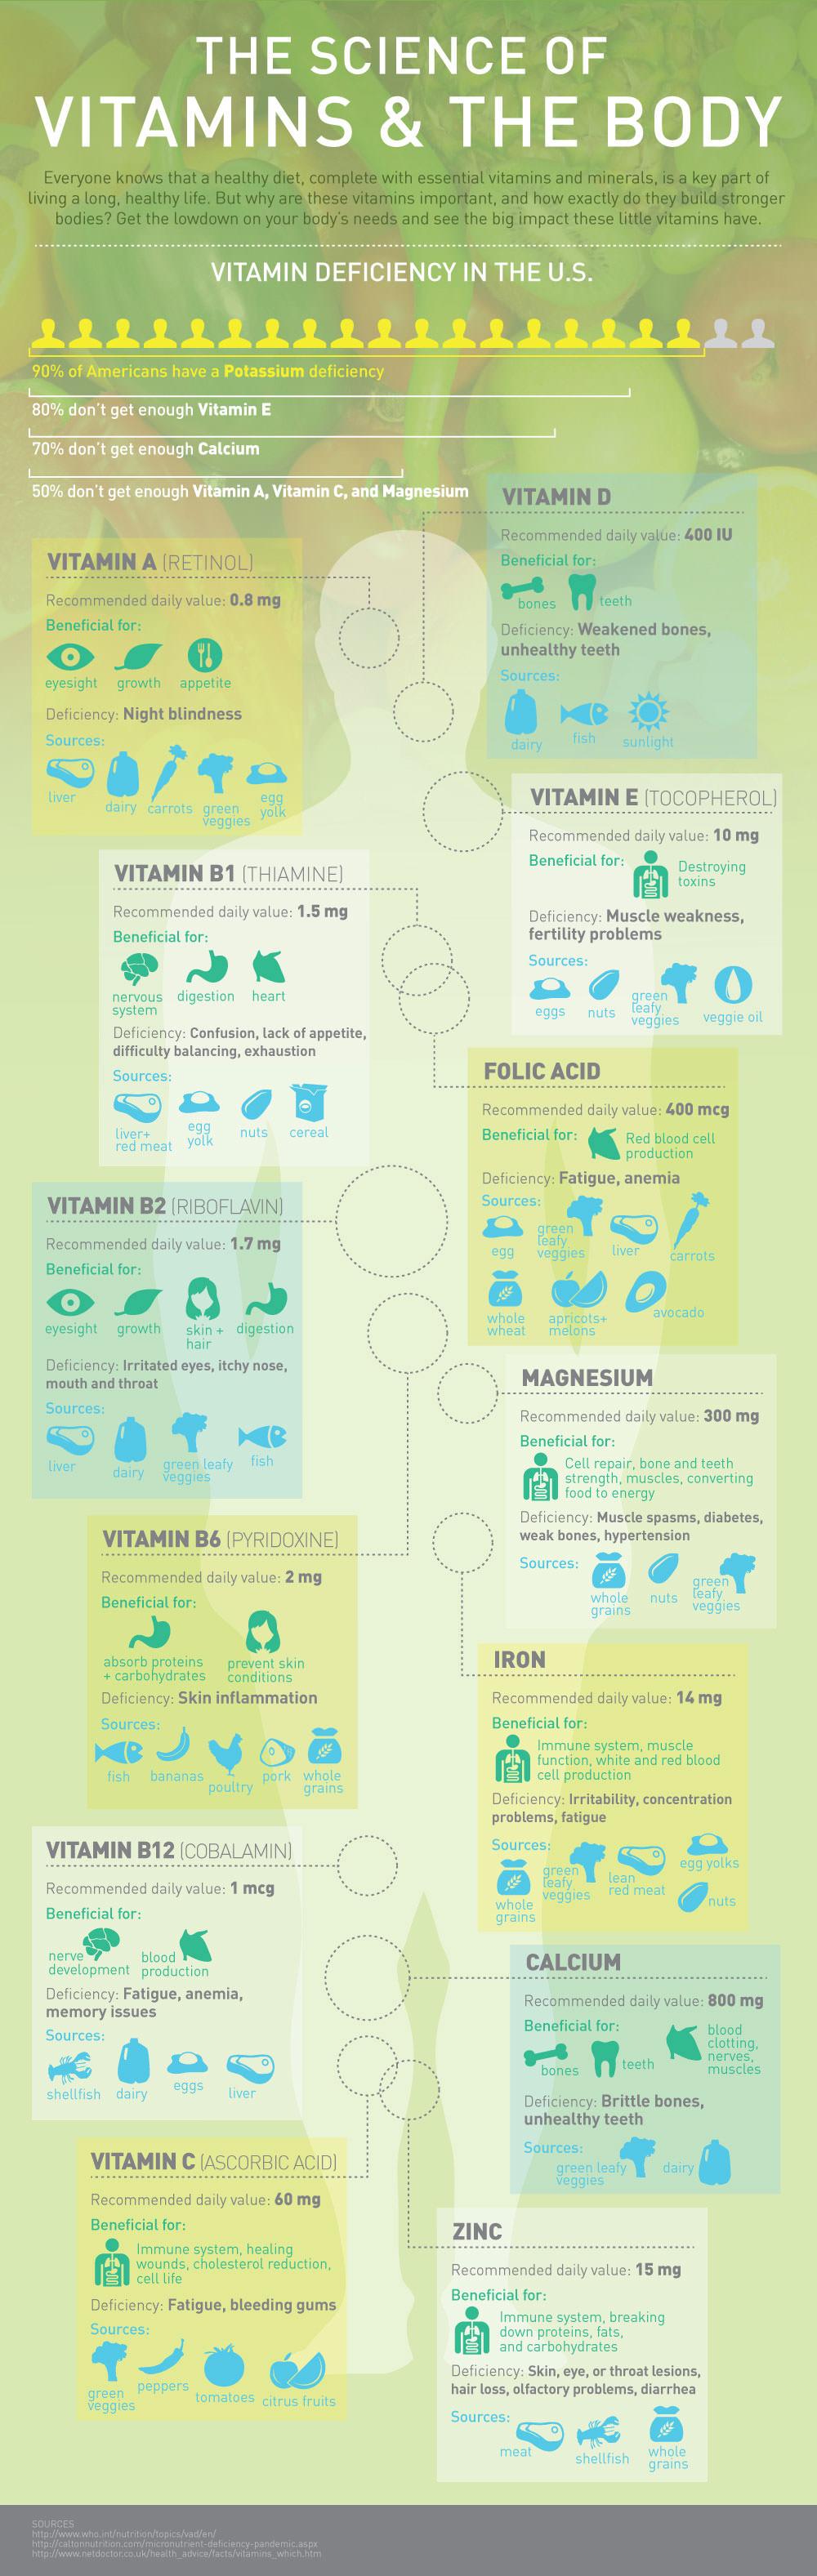 Vitamin Deficiency Infographic